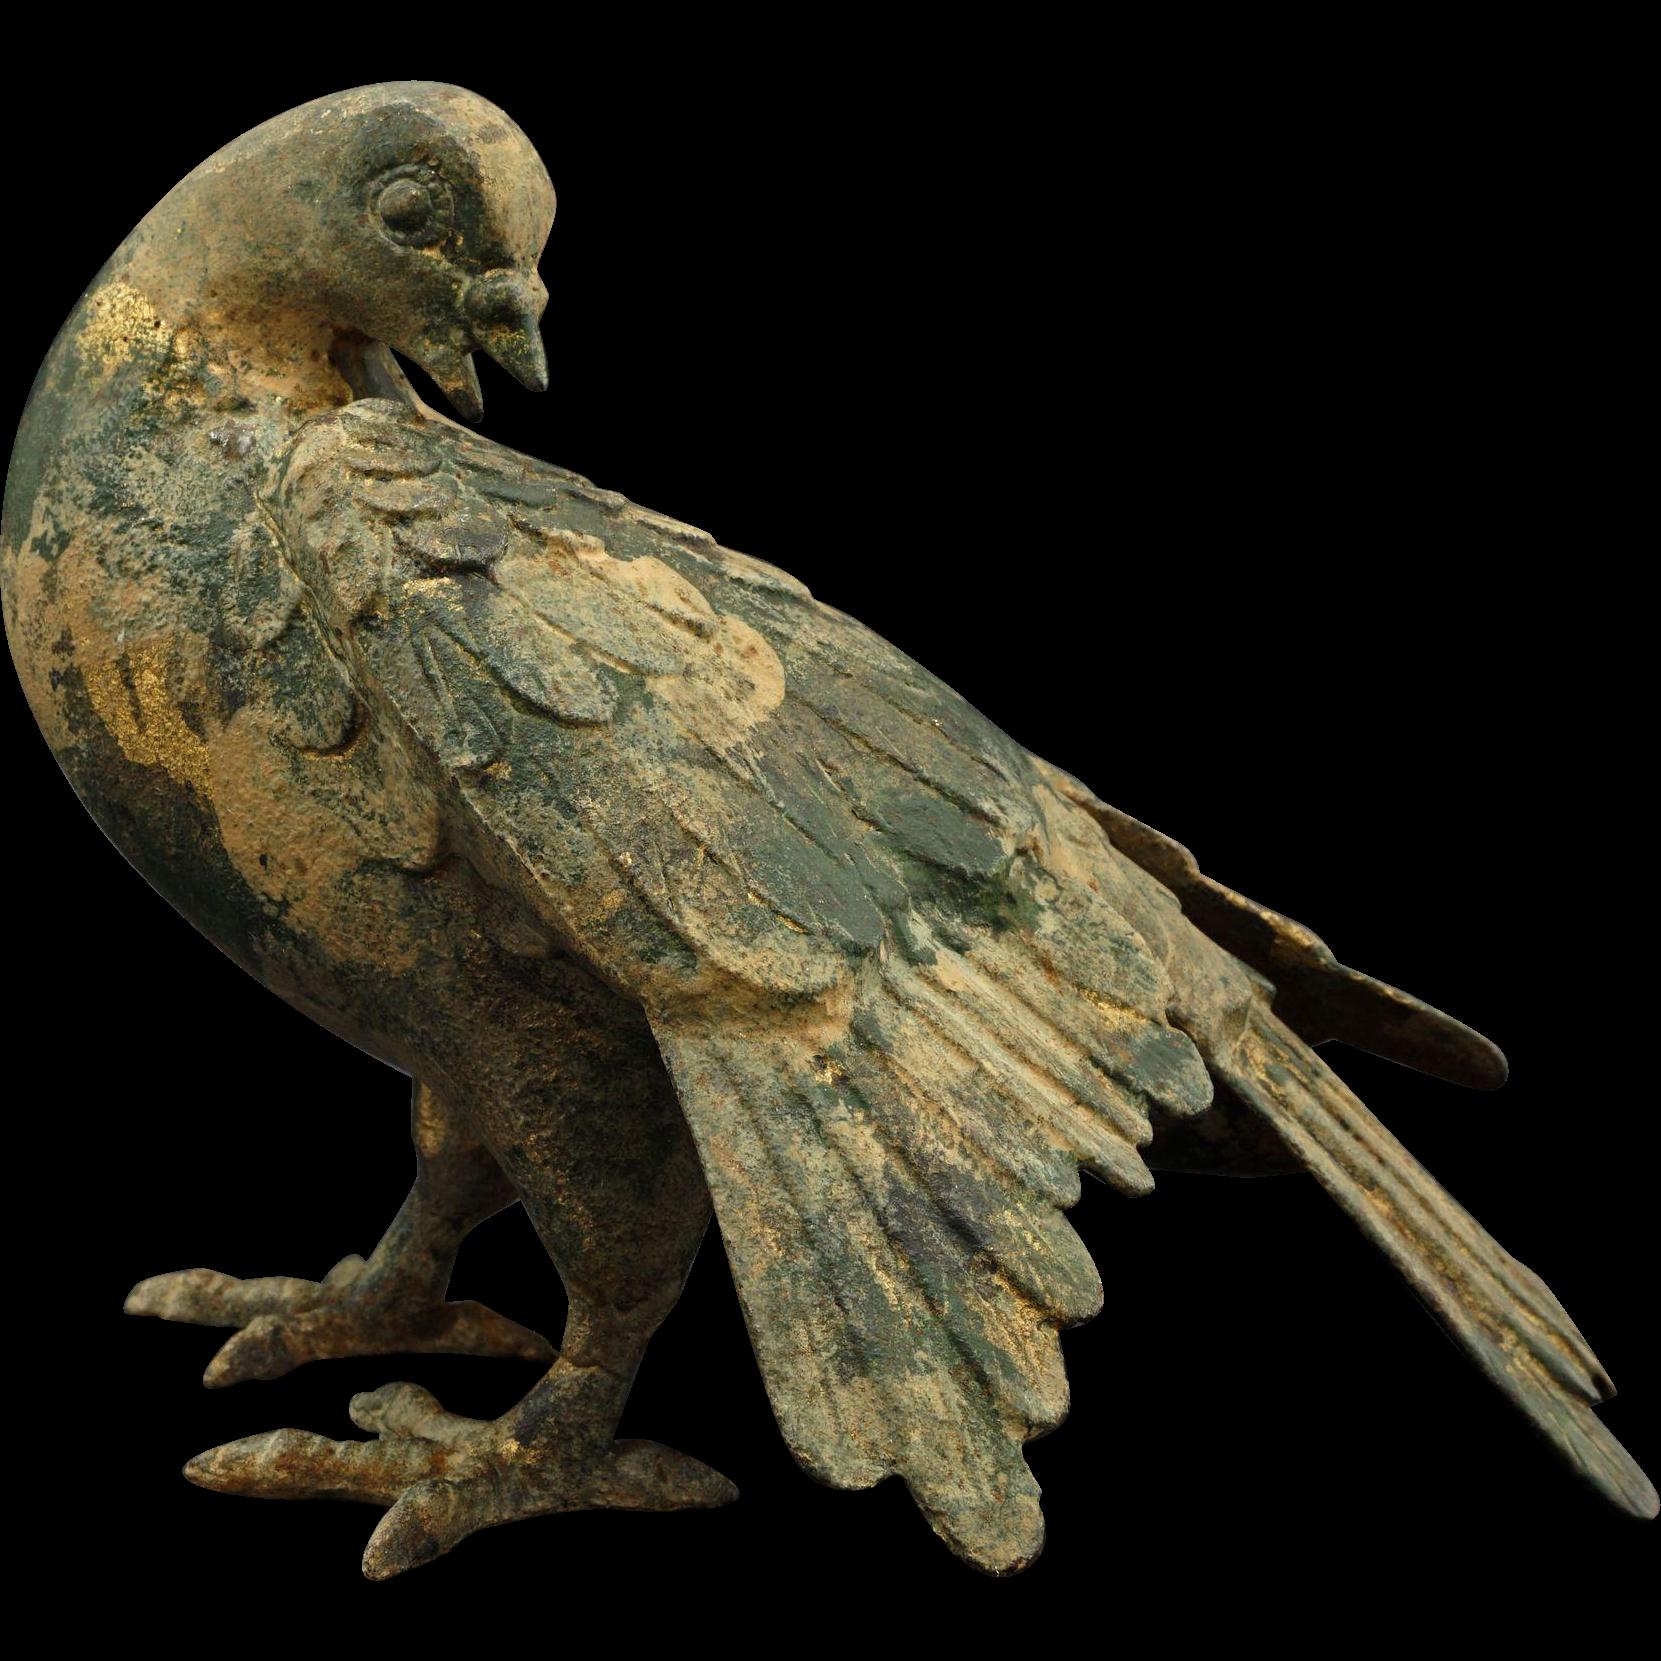 Japanese Patinated Cast Iron Dove / Pigeon / Bird - c. 1950's, Japan